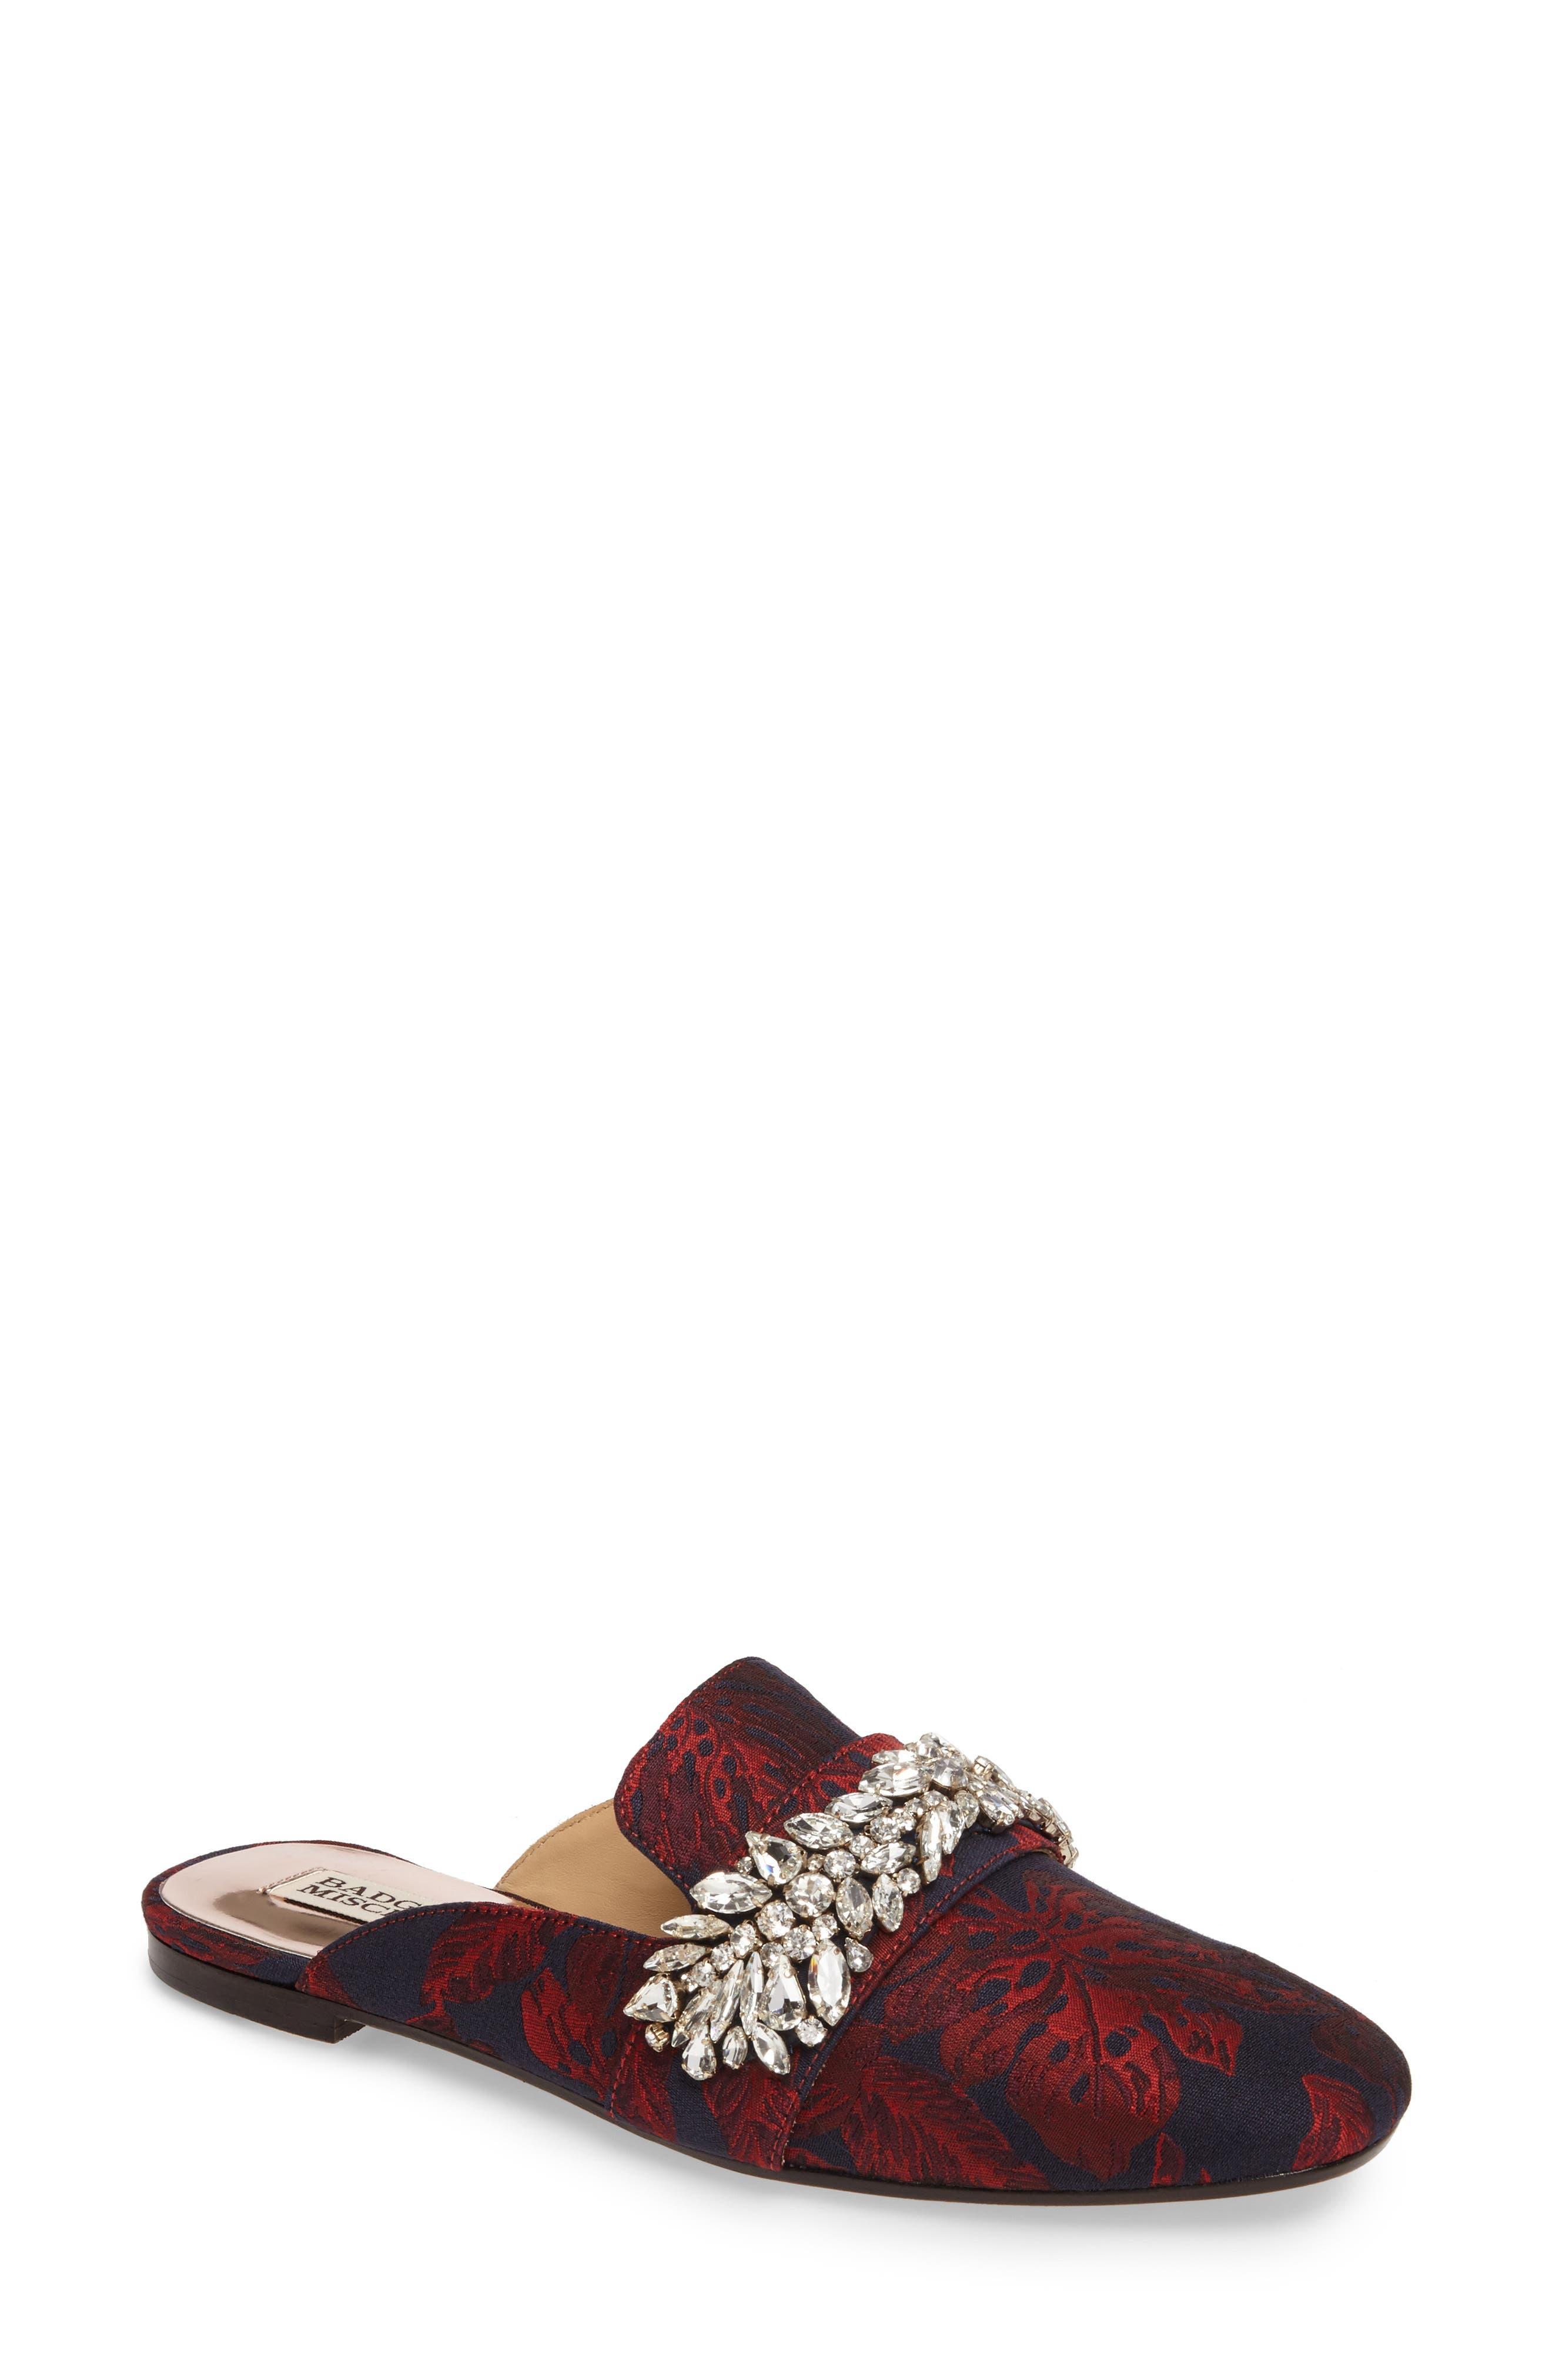 Kana Embellished Loafer Mule,                         Main,                         color, Burgundy Fabric